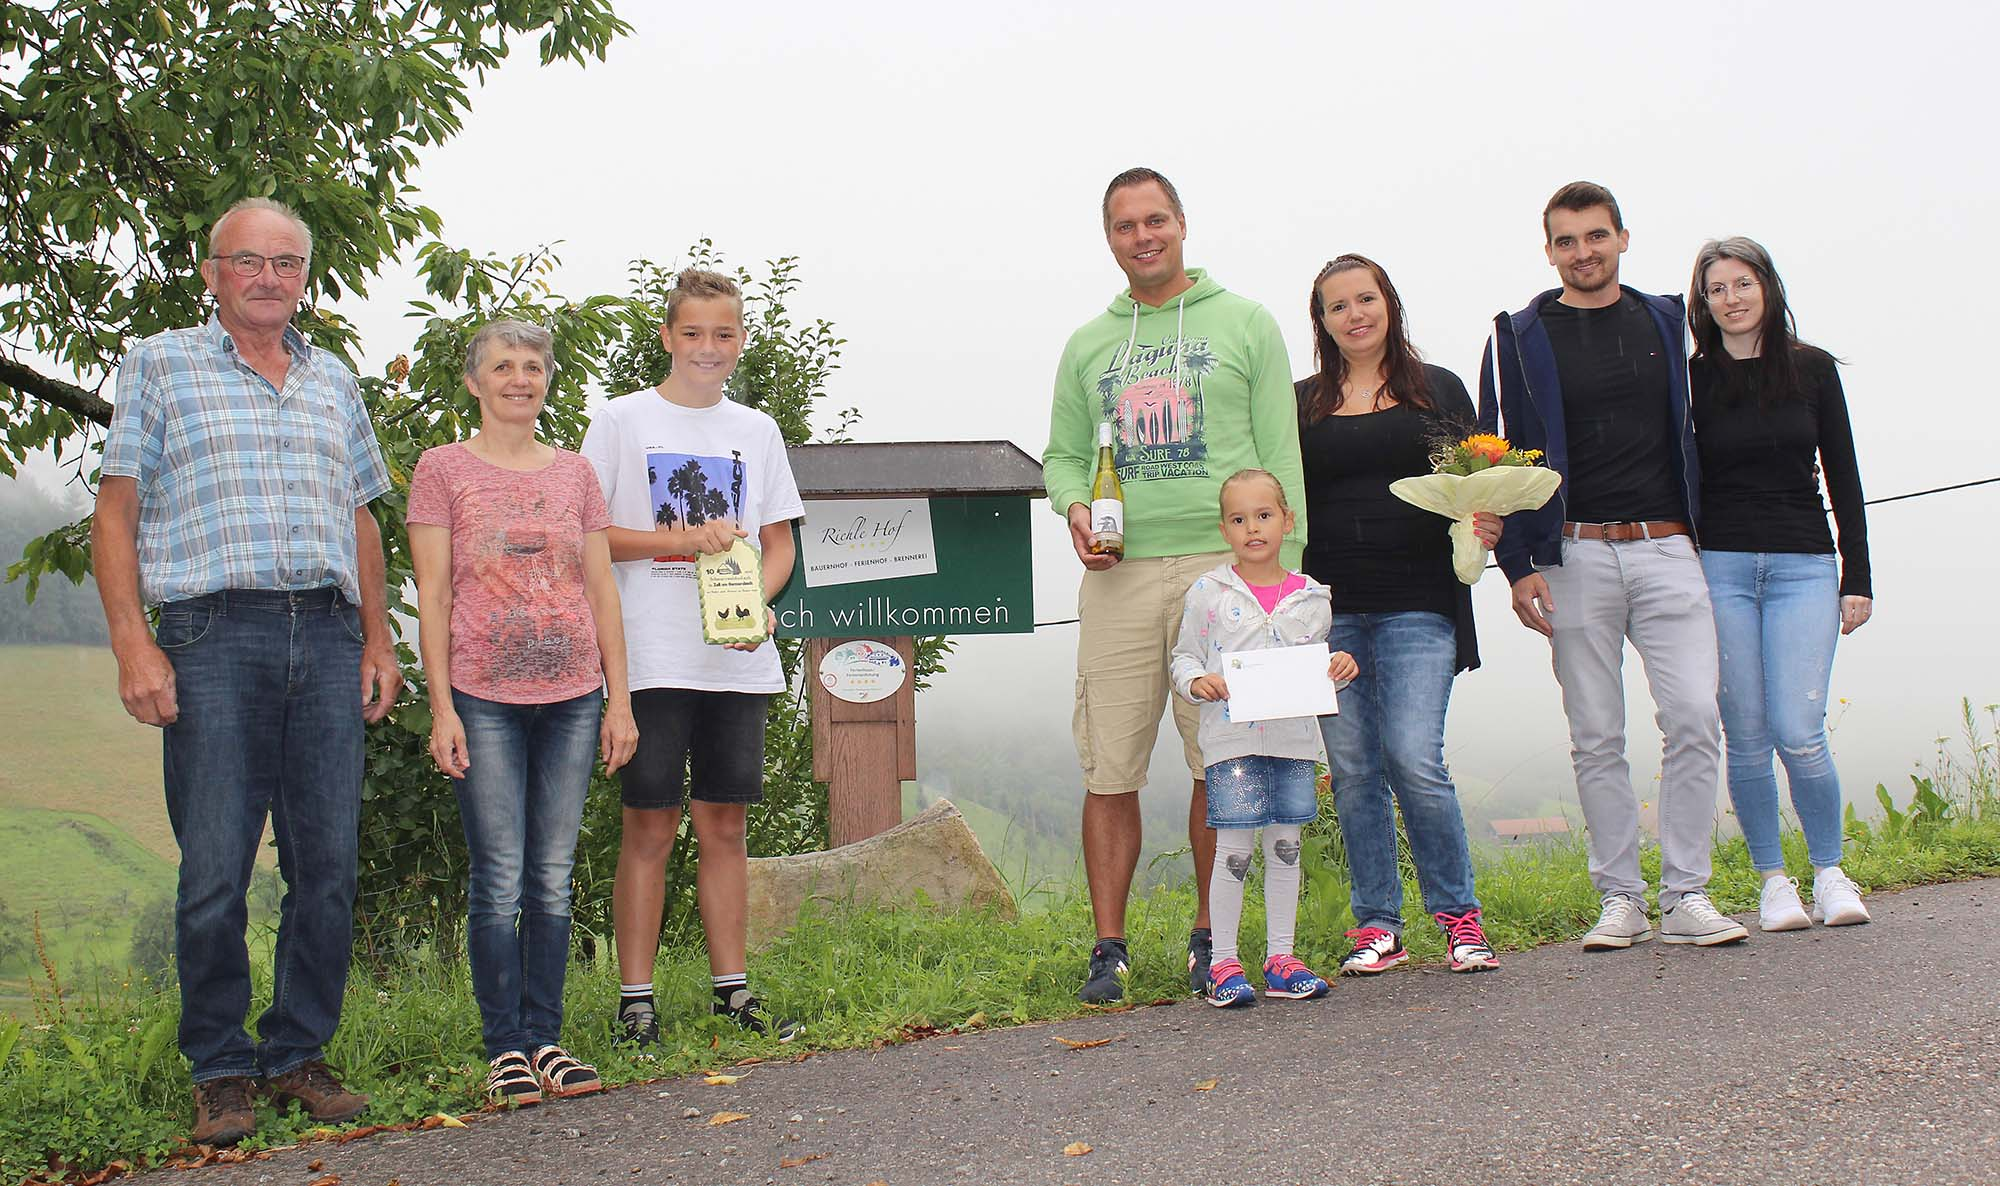 2021-8-11-ZE-OE-Tourist-Info-Gästeehrung Riehlehof-IMG_1597